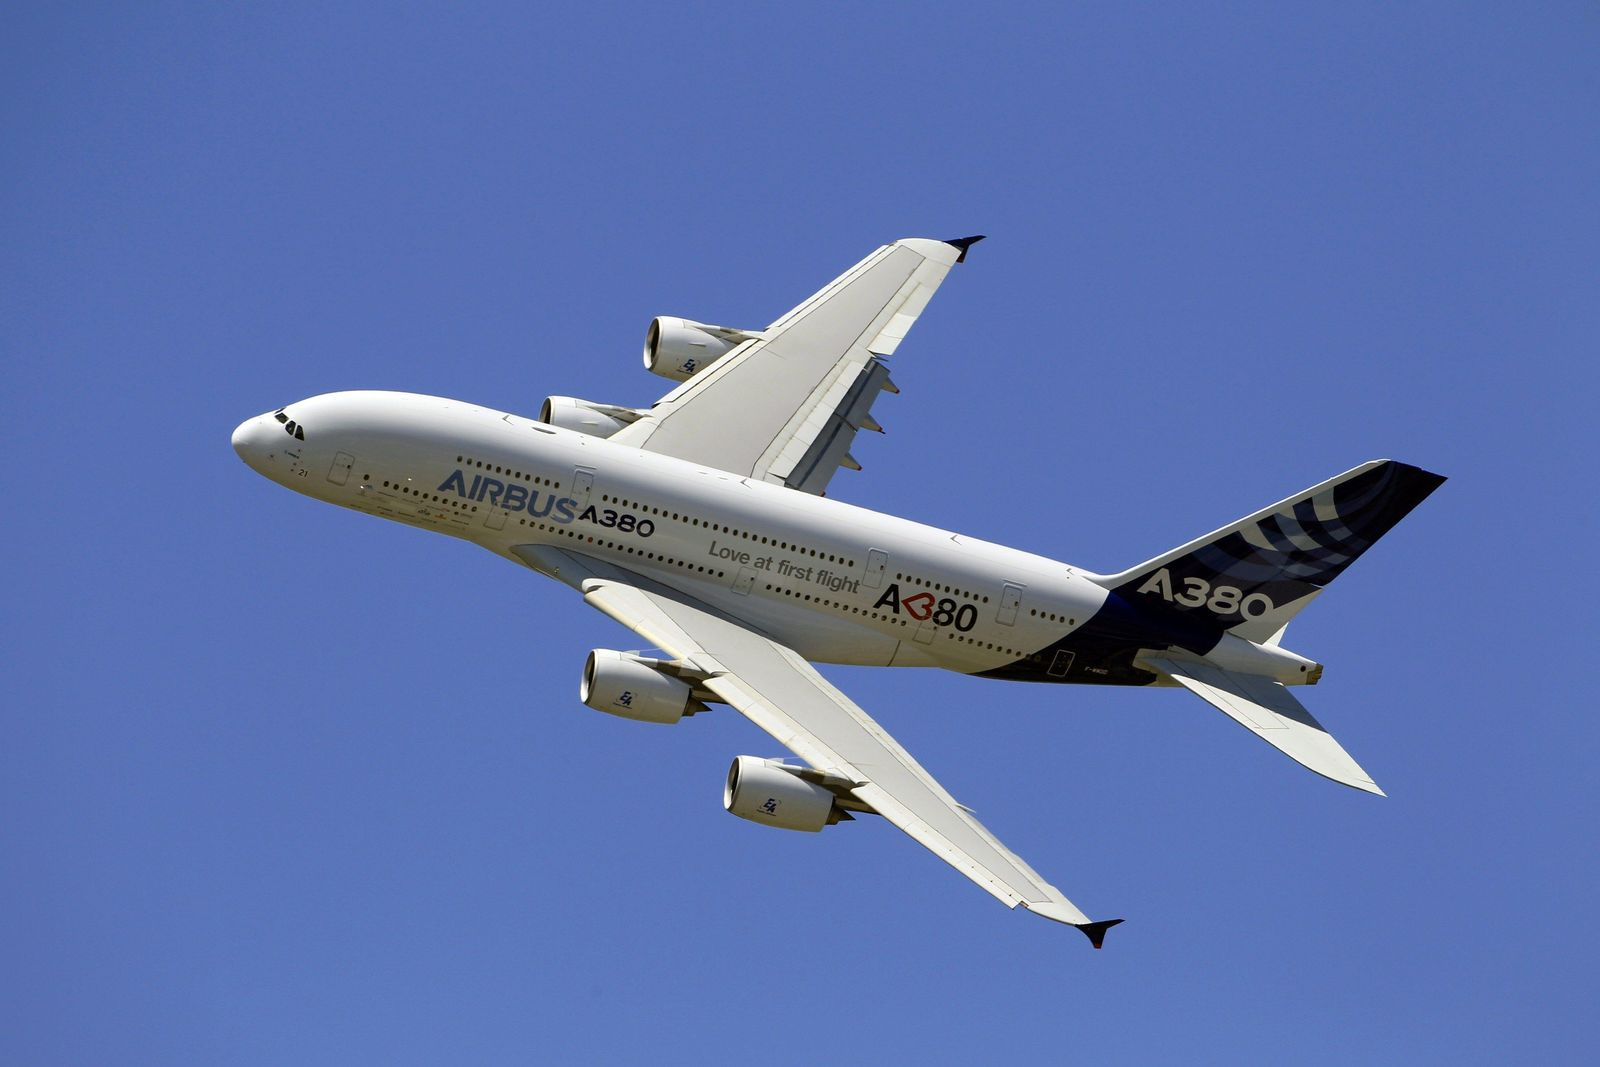 AIRBUS/A380